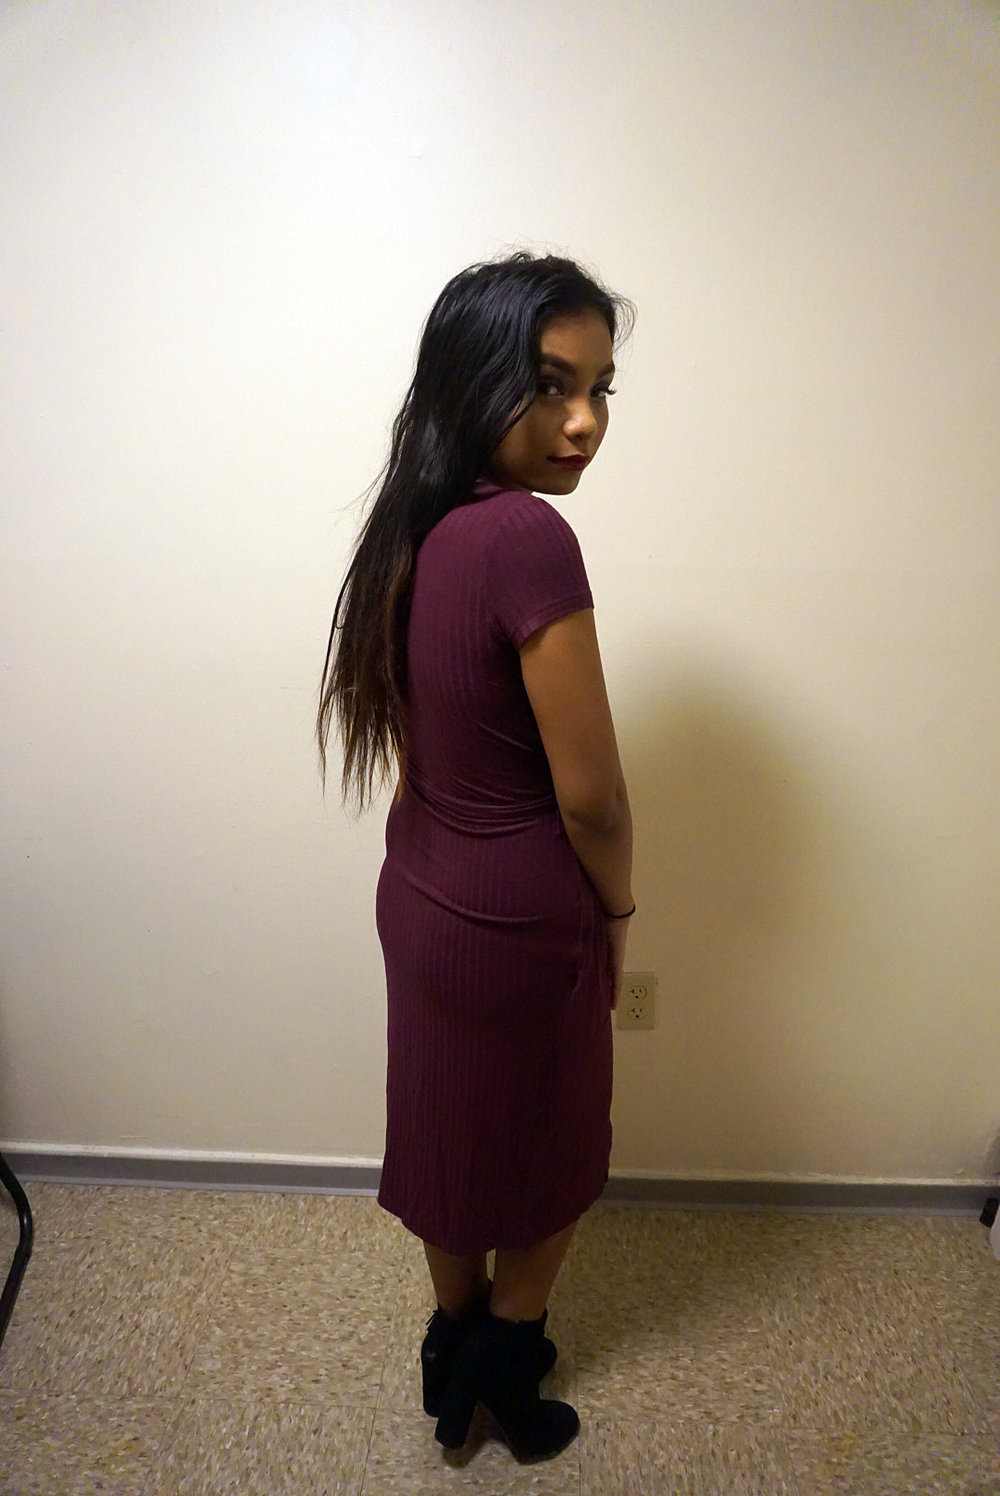 Classy-Low-Cut-Slit-Dress-Blogger-Style-LINDETENCHITRAN-2-1080x1616 .jpg